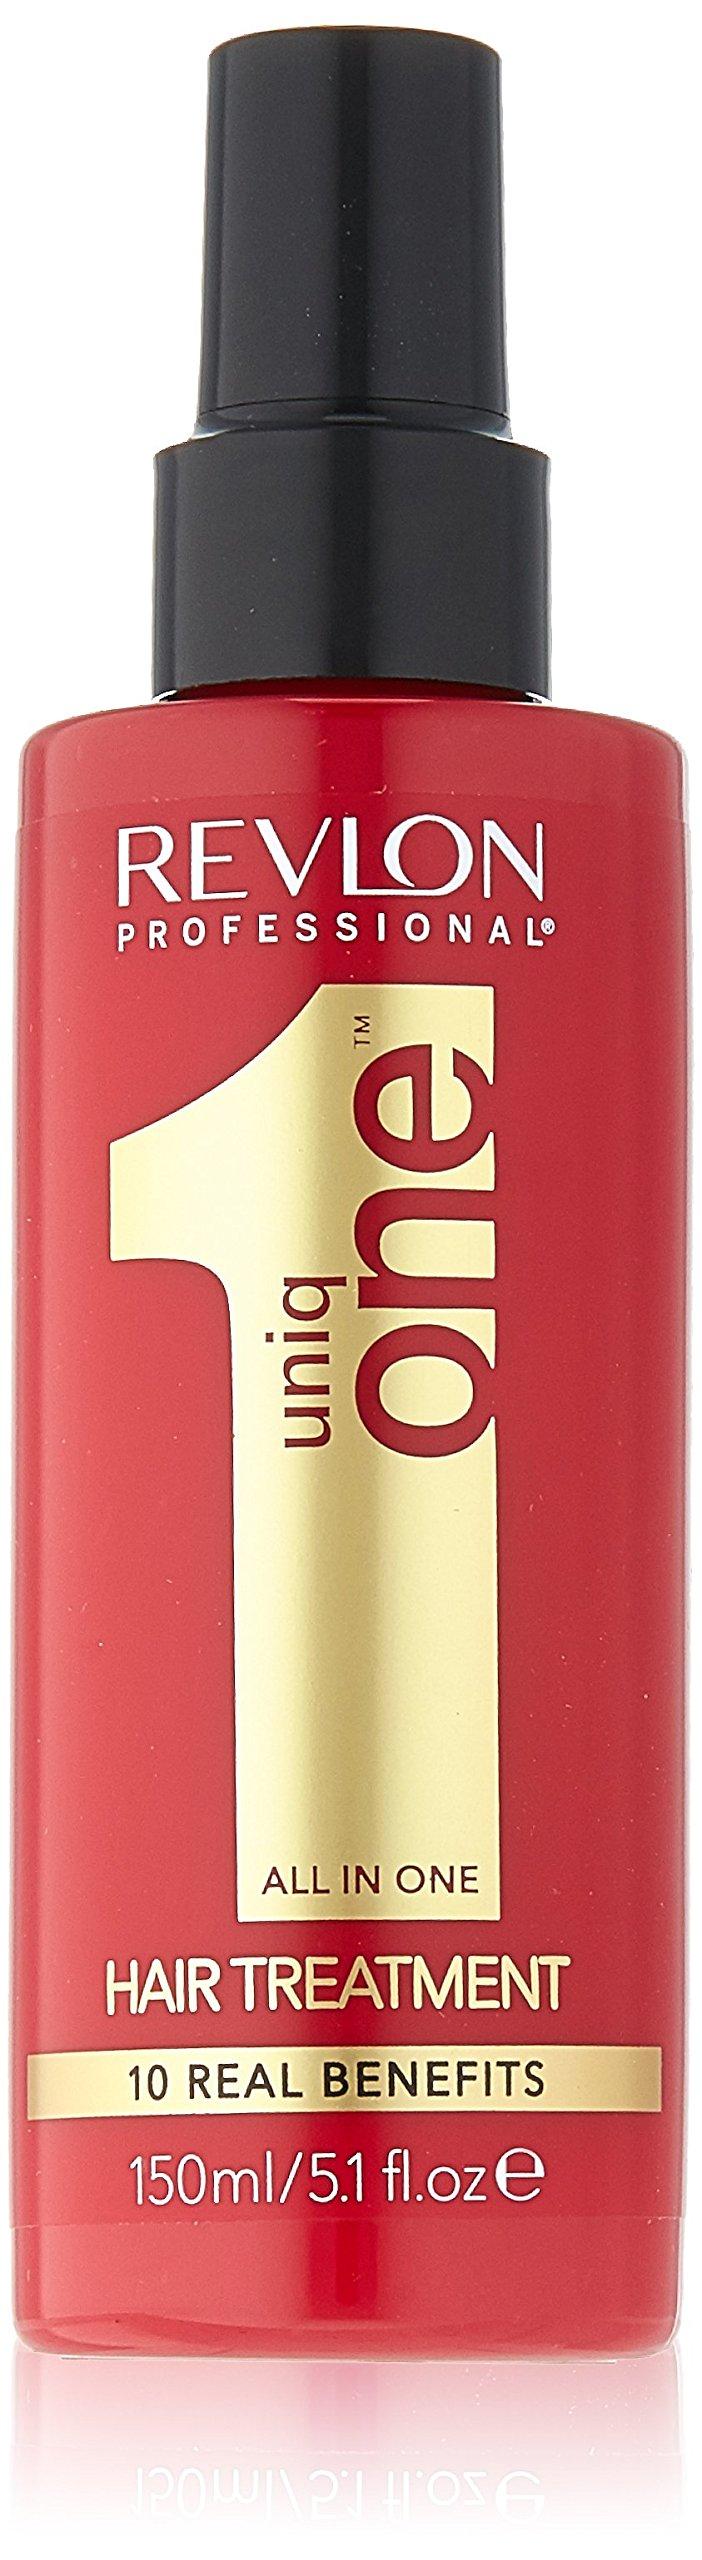 Revlon Uniq One All in One Hair Treatment (2 Pack) 5.1 oz